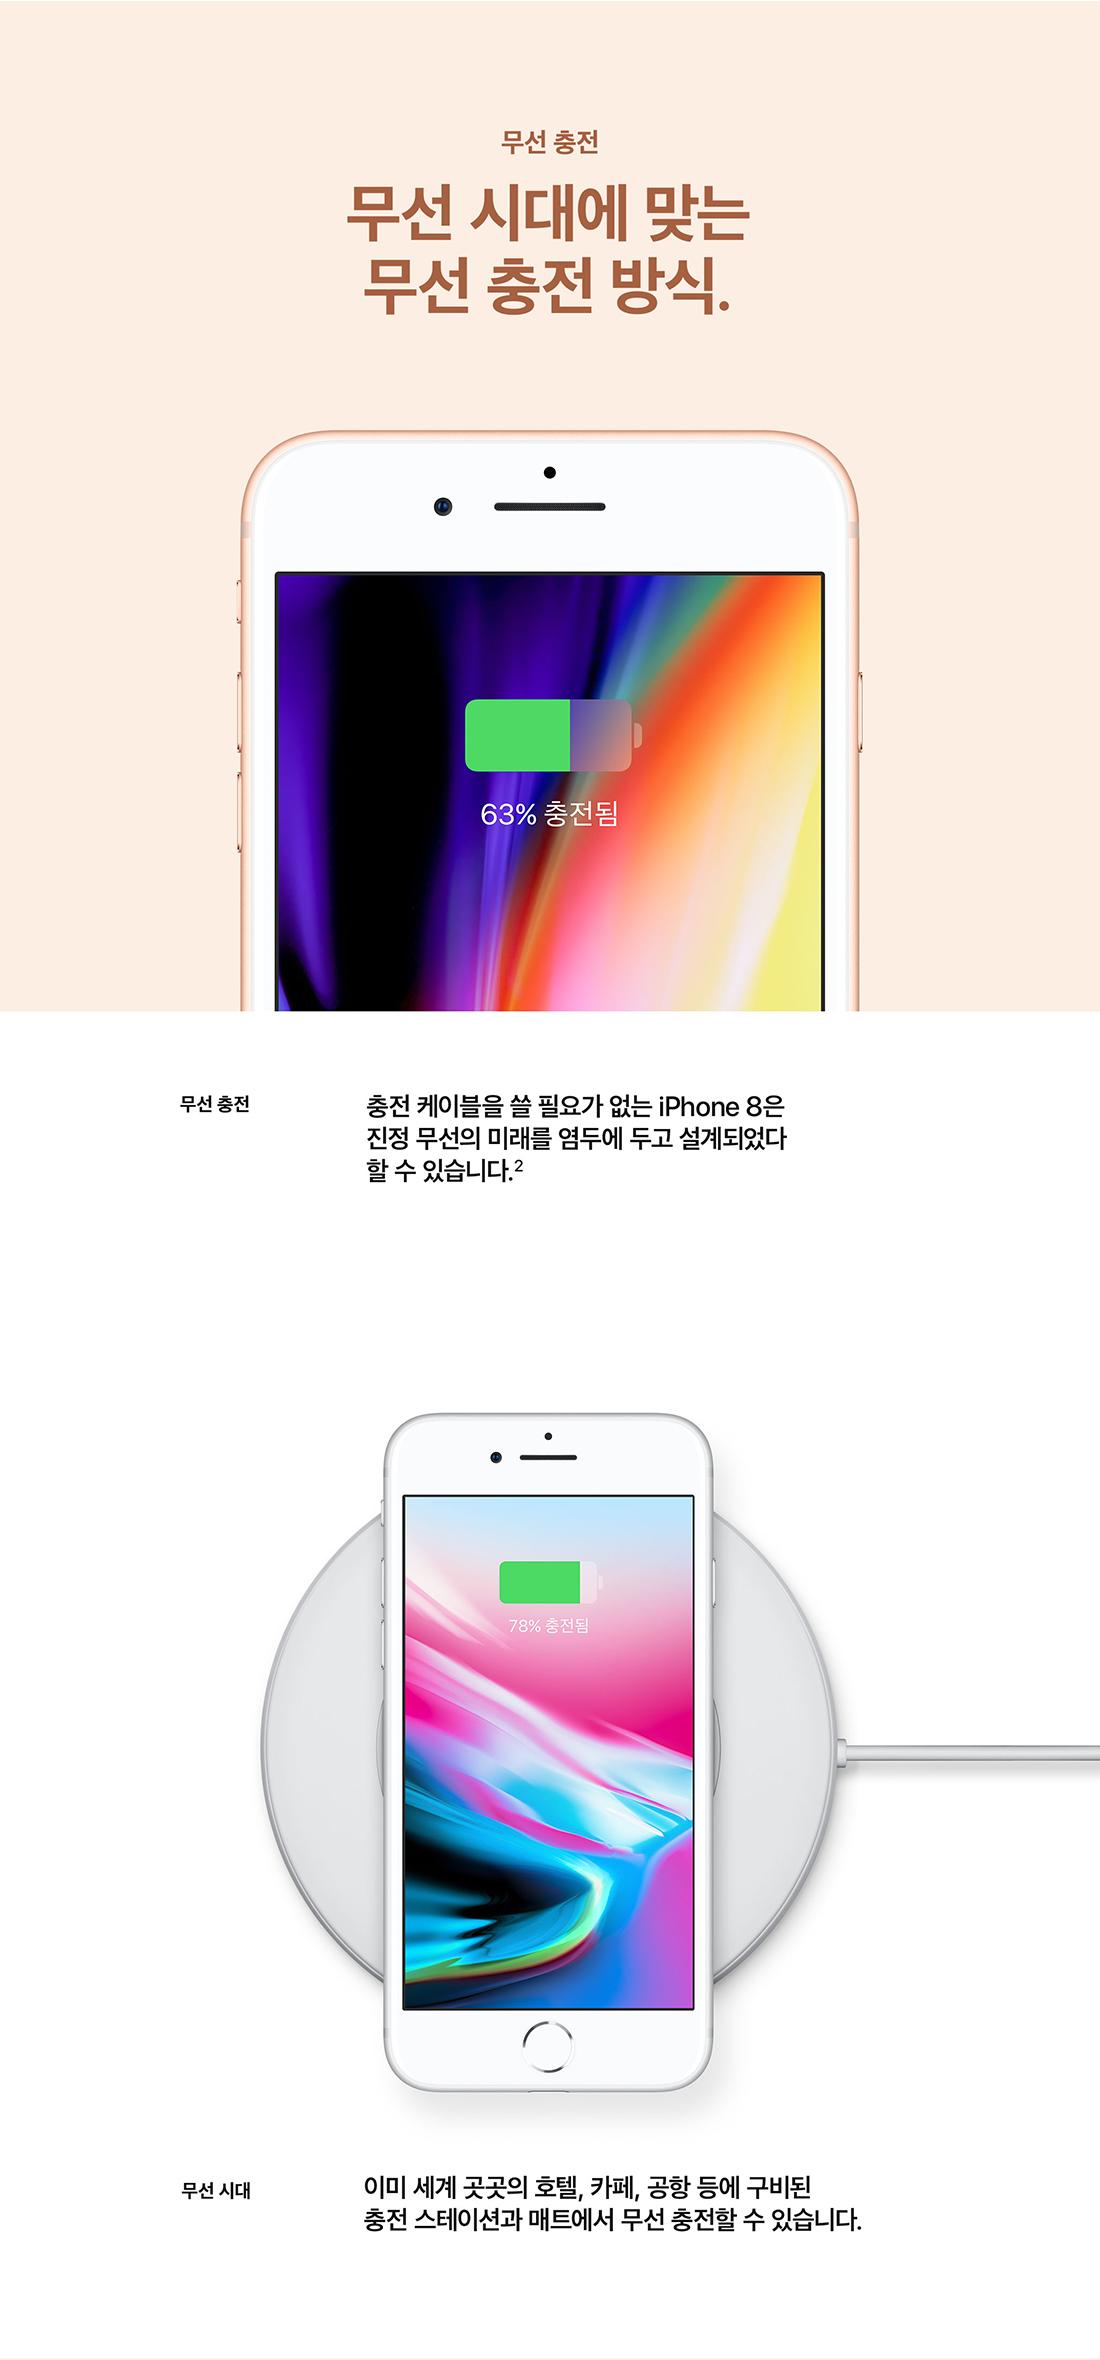 iPhone 8. 재색겸비. iPhone 8은 새로움으로 가득합니다. 무선 충전 (자세한 내용은 하단 문구 참조)